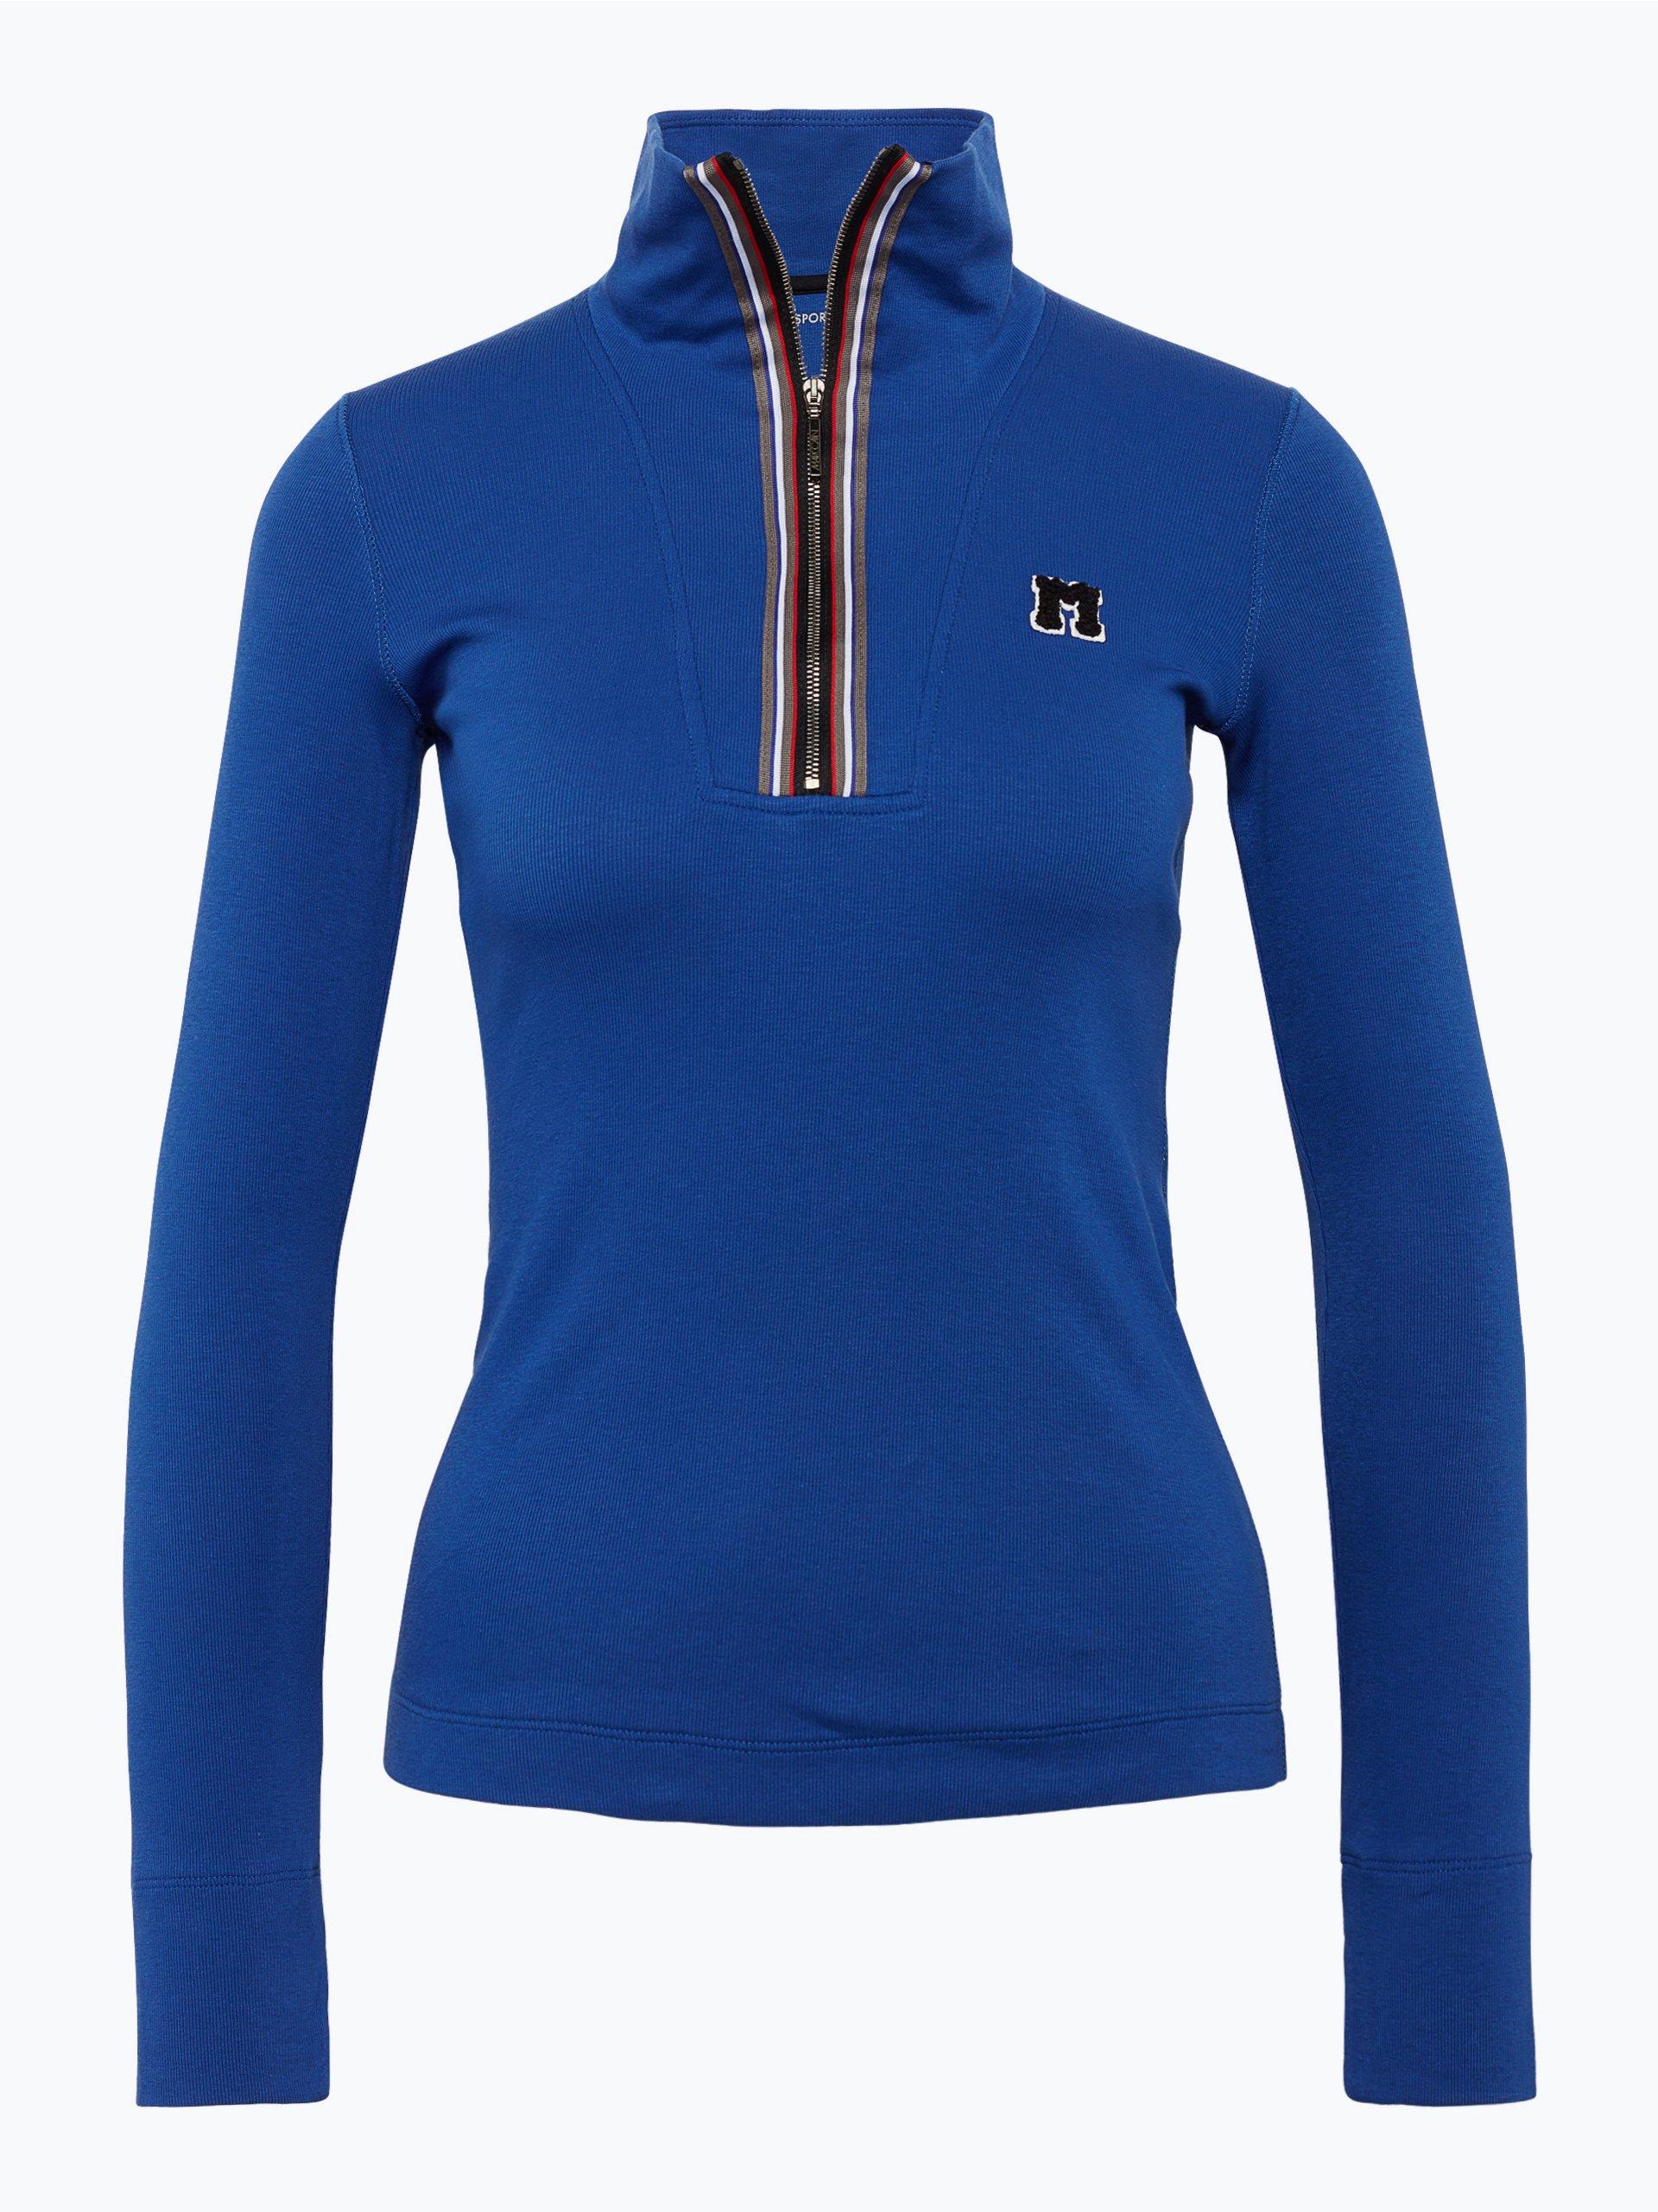 marc cain sports damen sportswear langarmshirt royal uni online kaufen peek und cloppenburg de. Black Bedroom Furniture Sets. Home Design Ideas